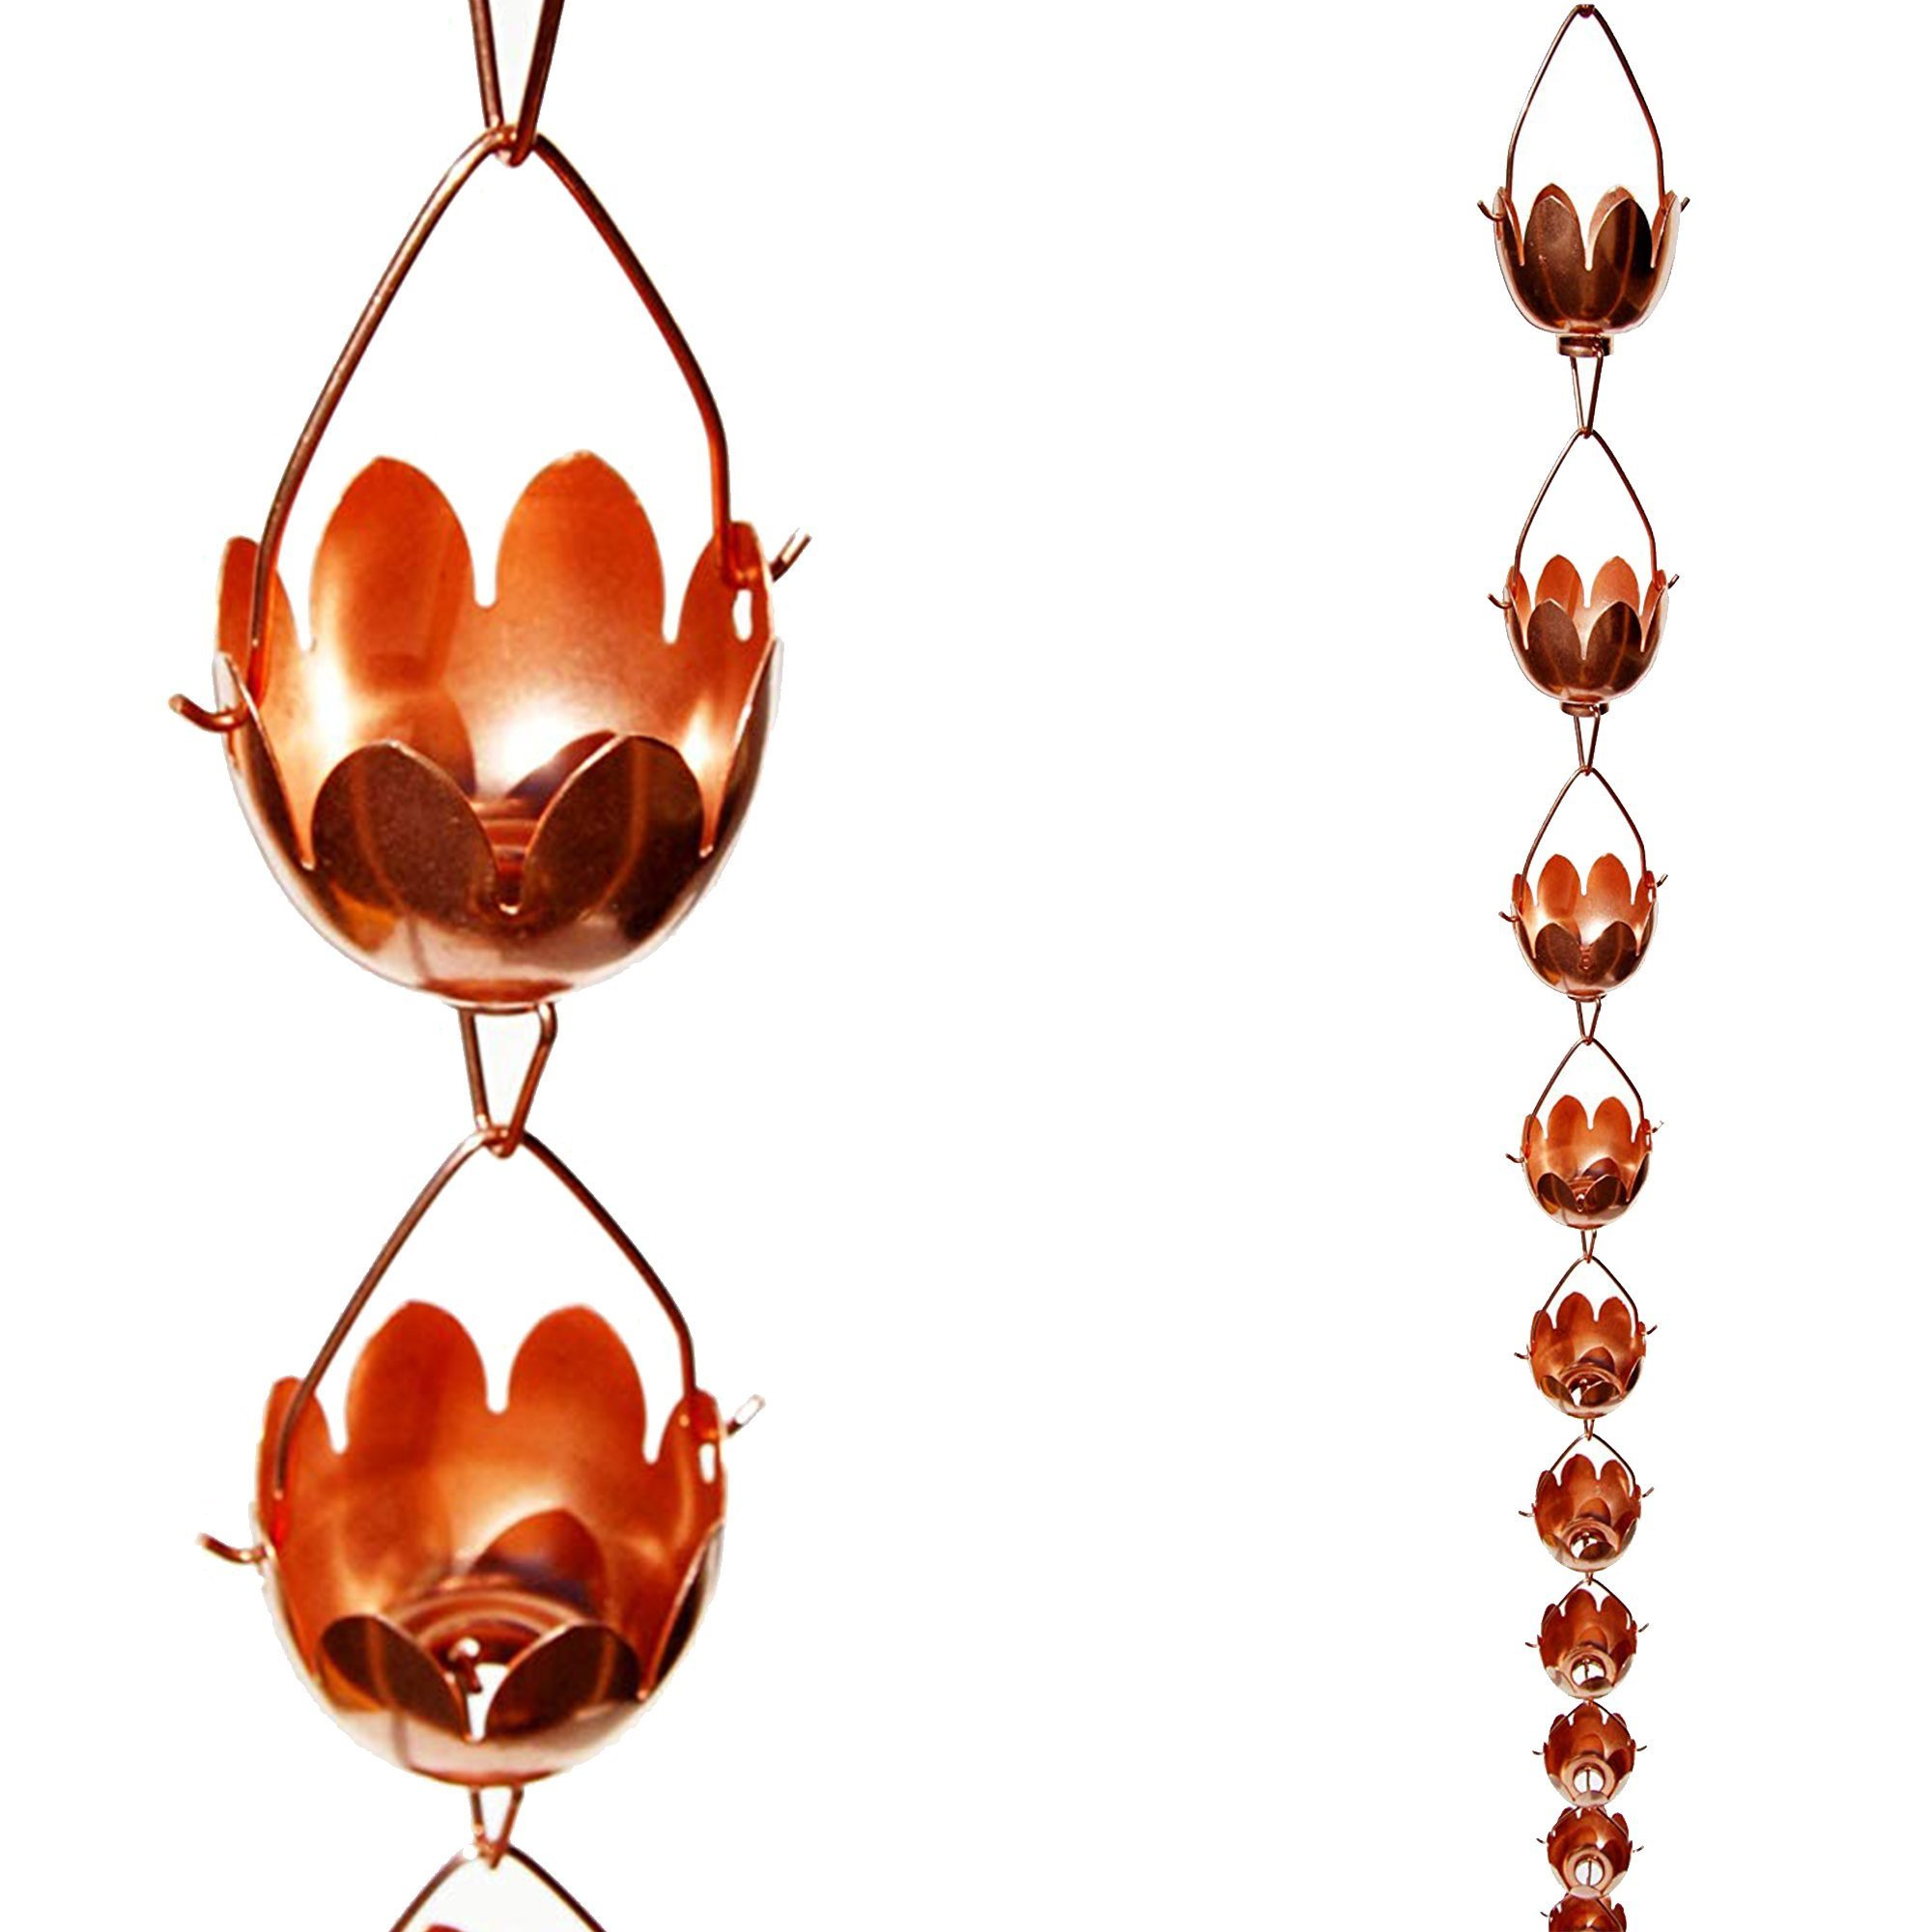 Stanwood Rain Chain Lotus Lily Flower Copper Rain Chain, 8-Feet